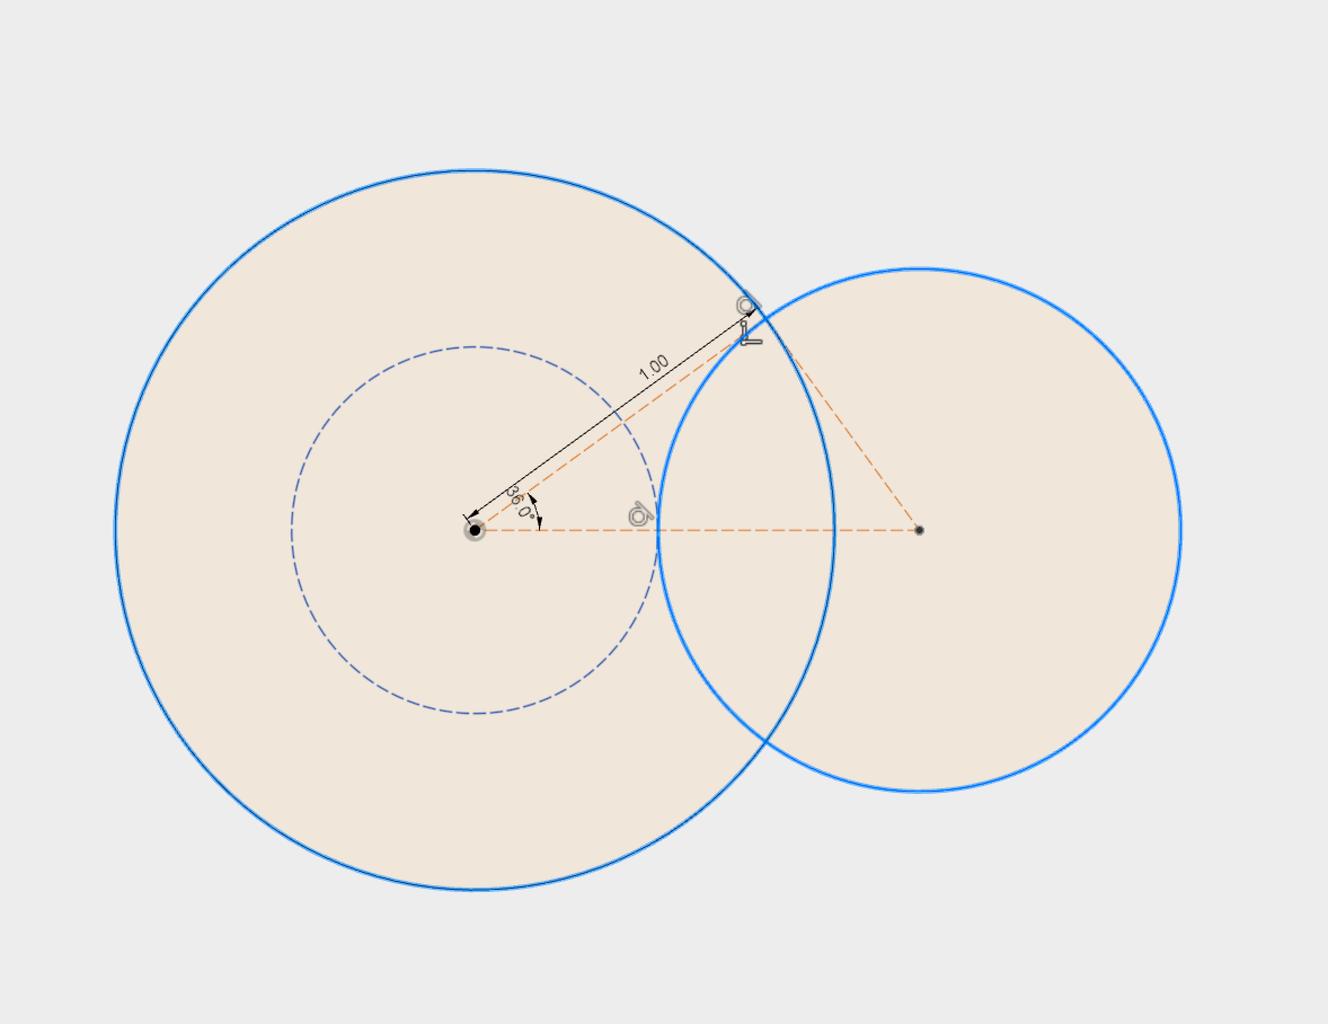 Diameters of the Geneva Wheel and the Drive Wheel